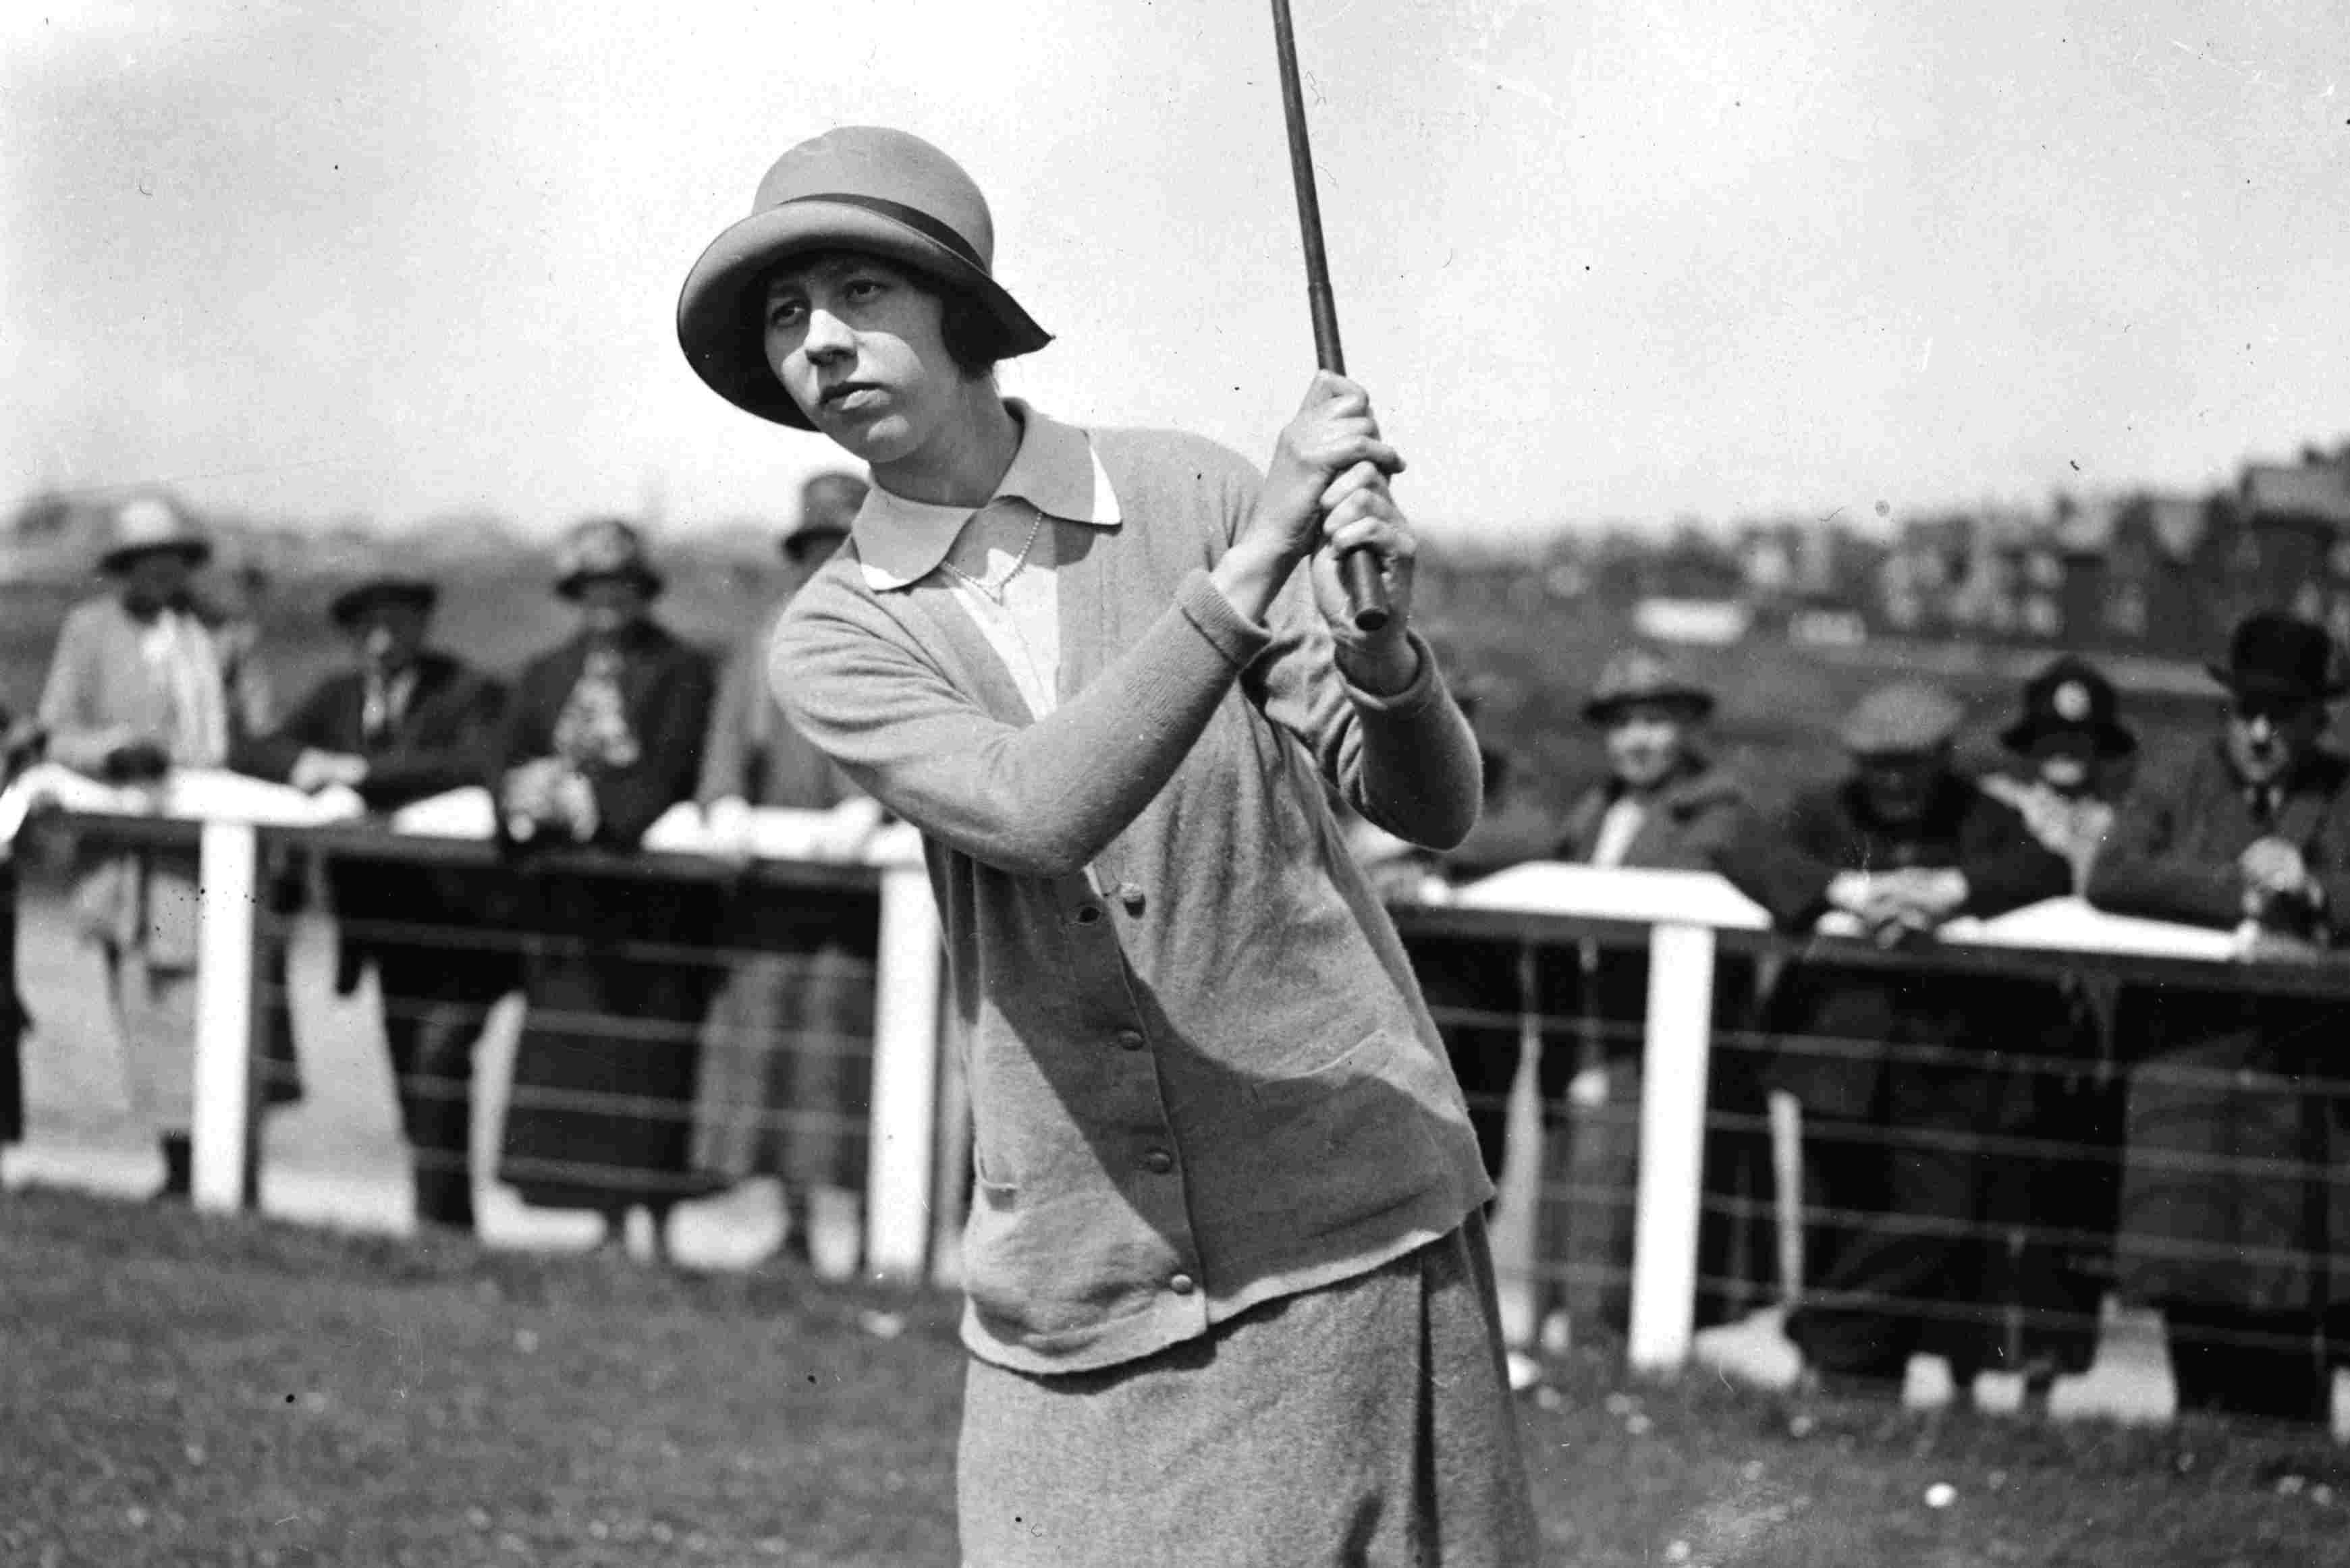 Golfer Joyce Wethered in 1925